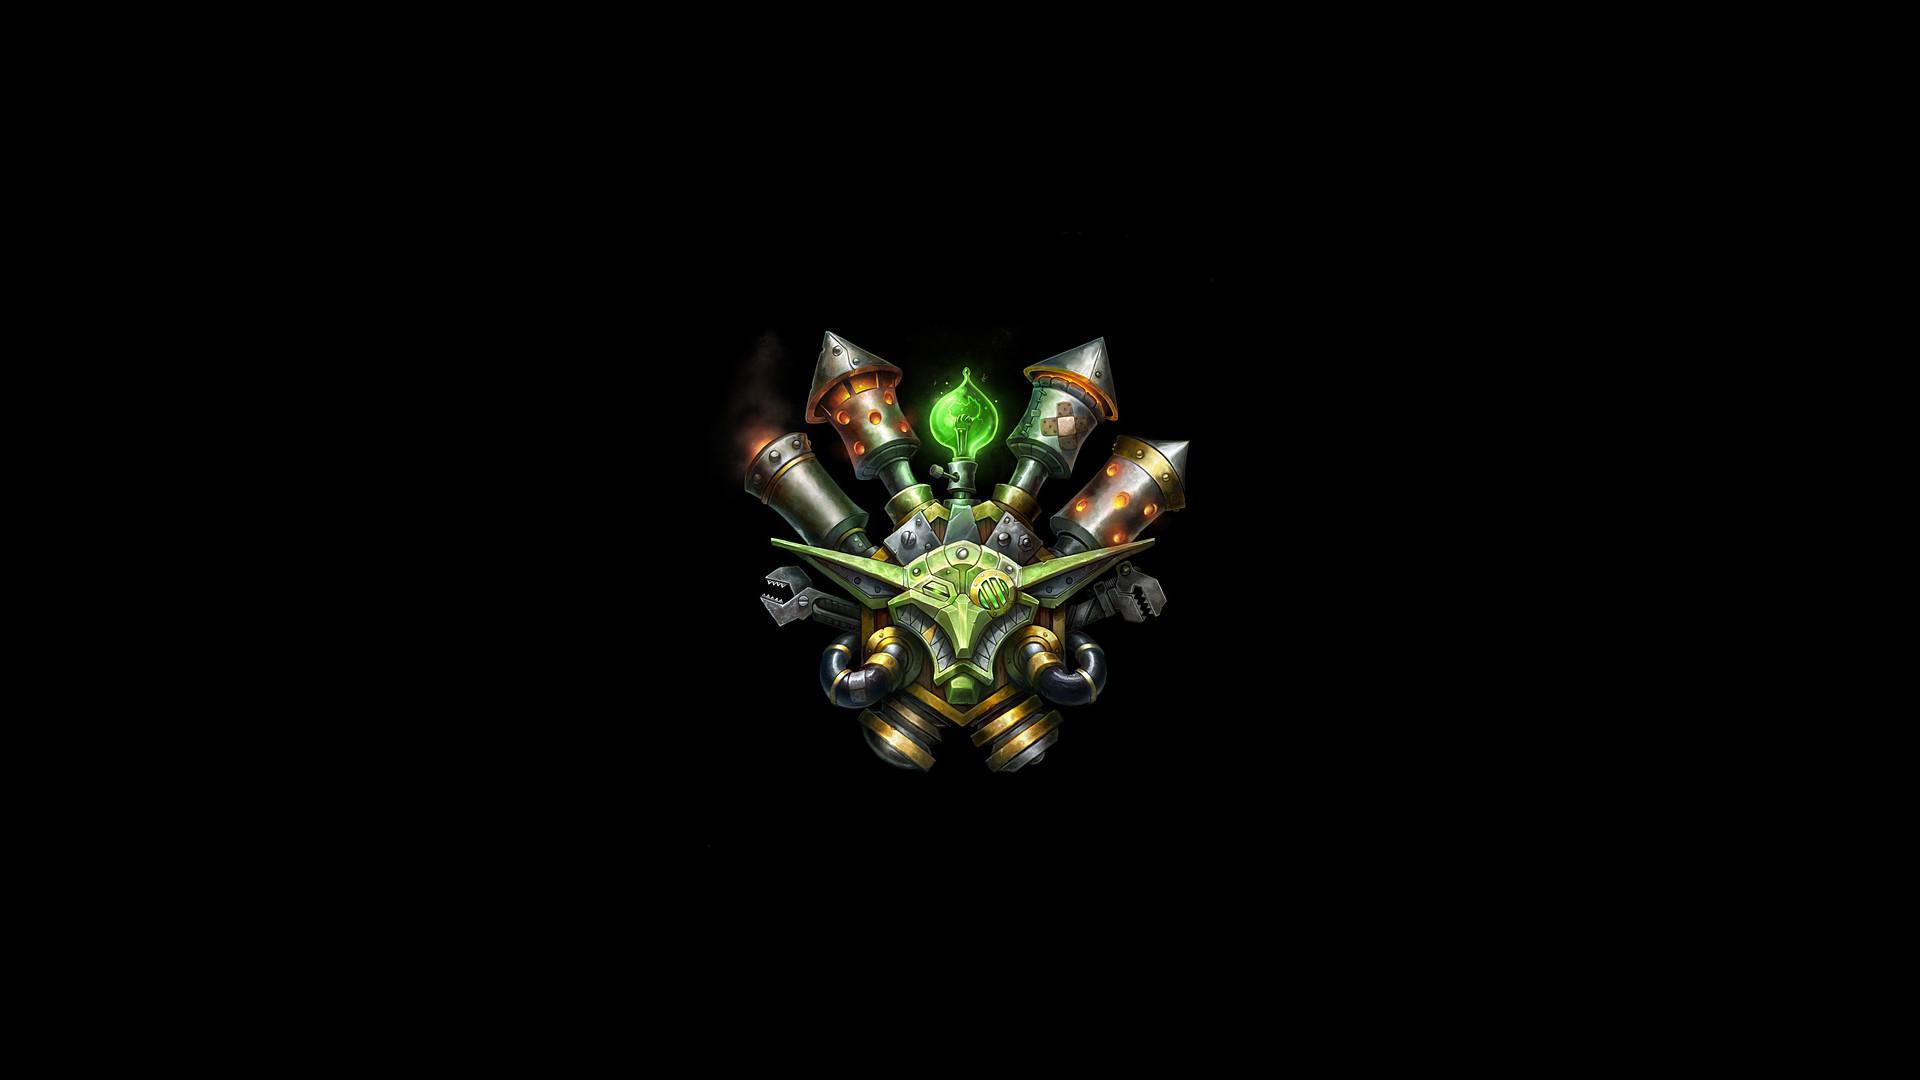 Free Goblin Crest wallpaper background